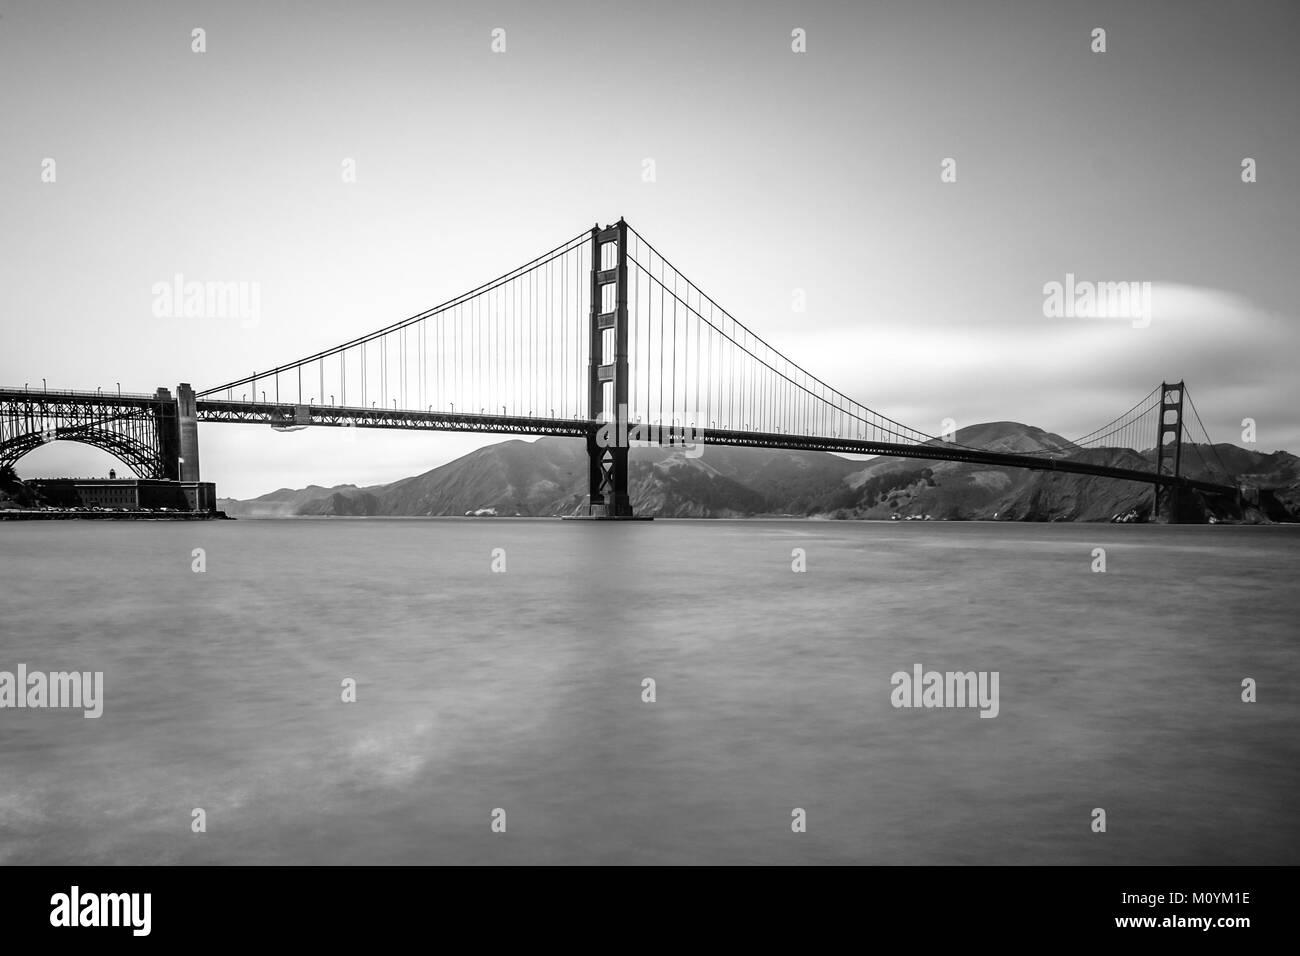 Golden Gate Bridge, San Francisco, California, USA - Stock Image